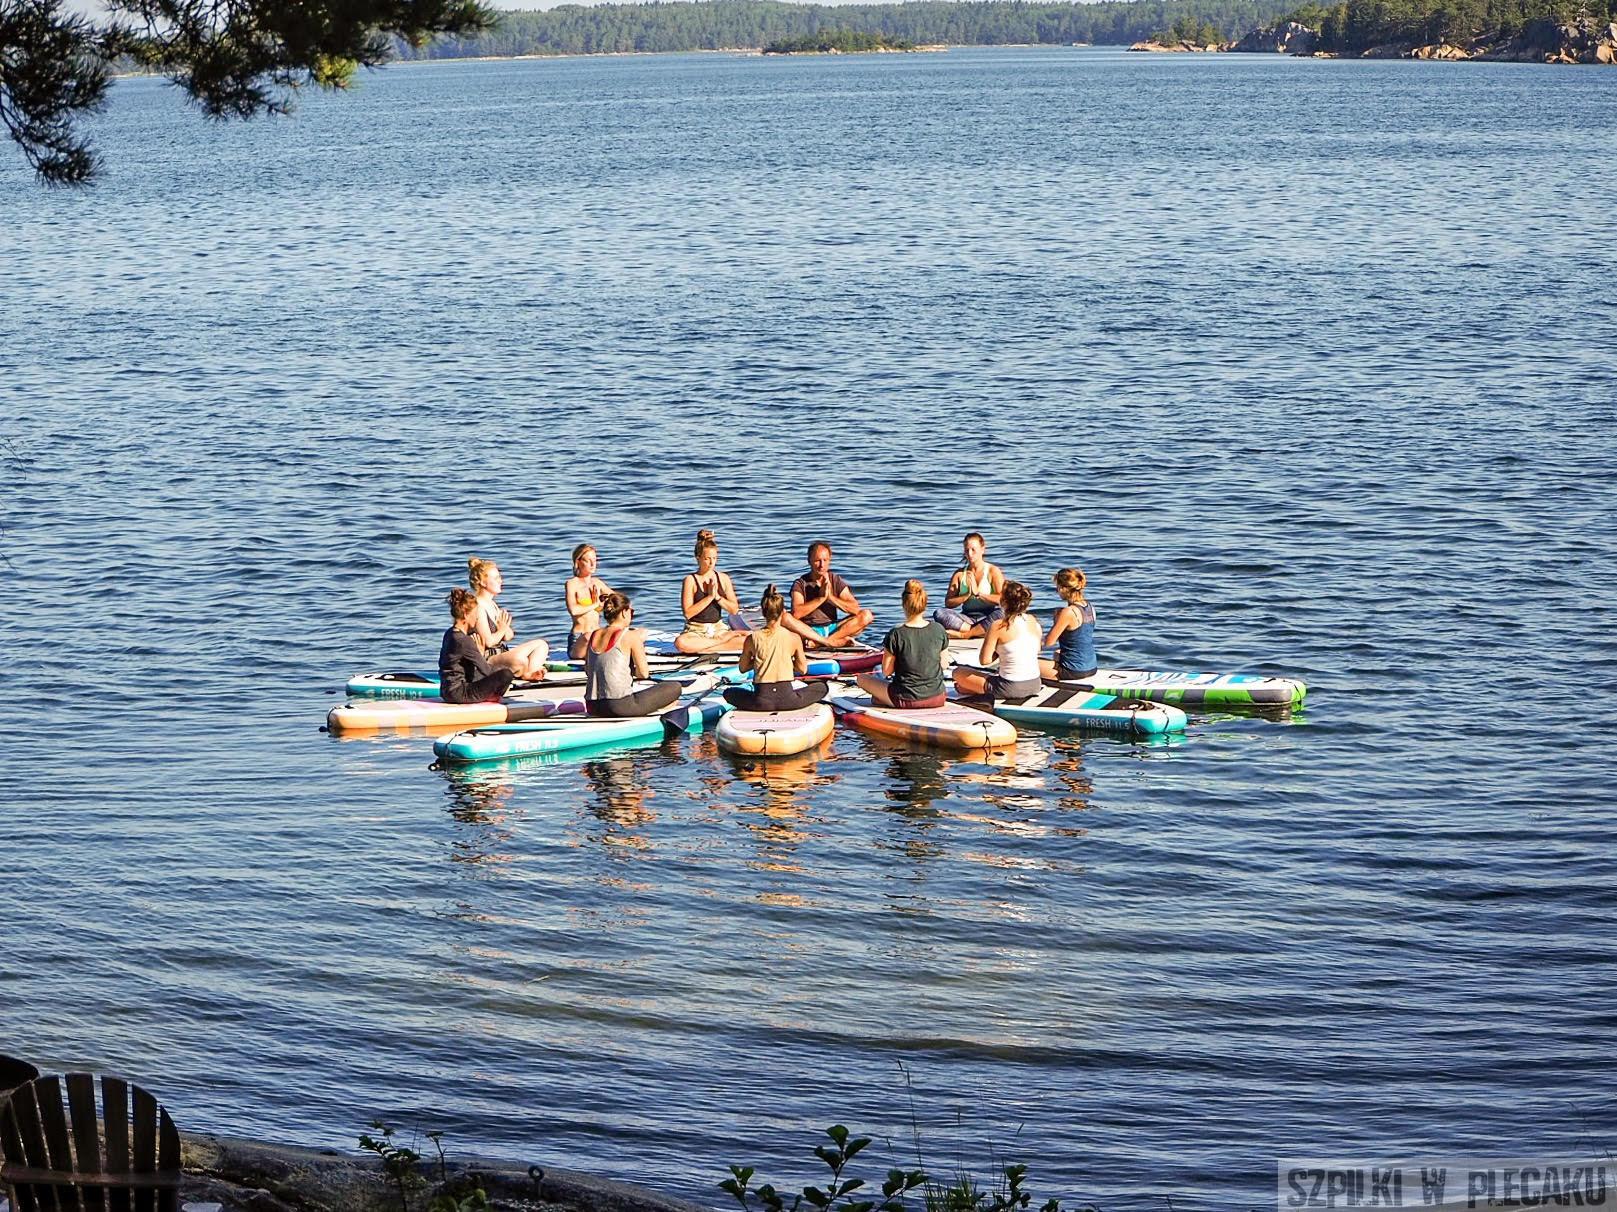 #gobackpack camp - Szpilki w plecaku - Szwecja - yoga